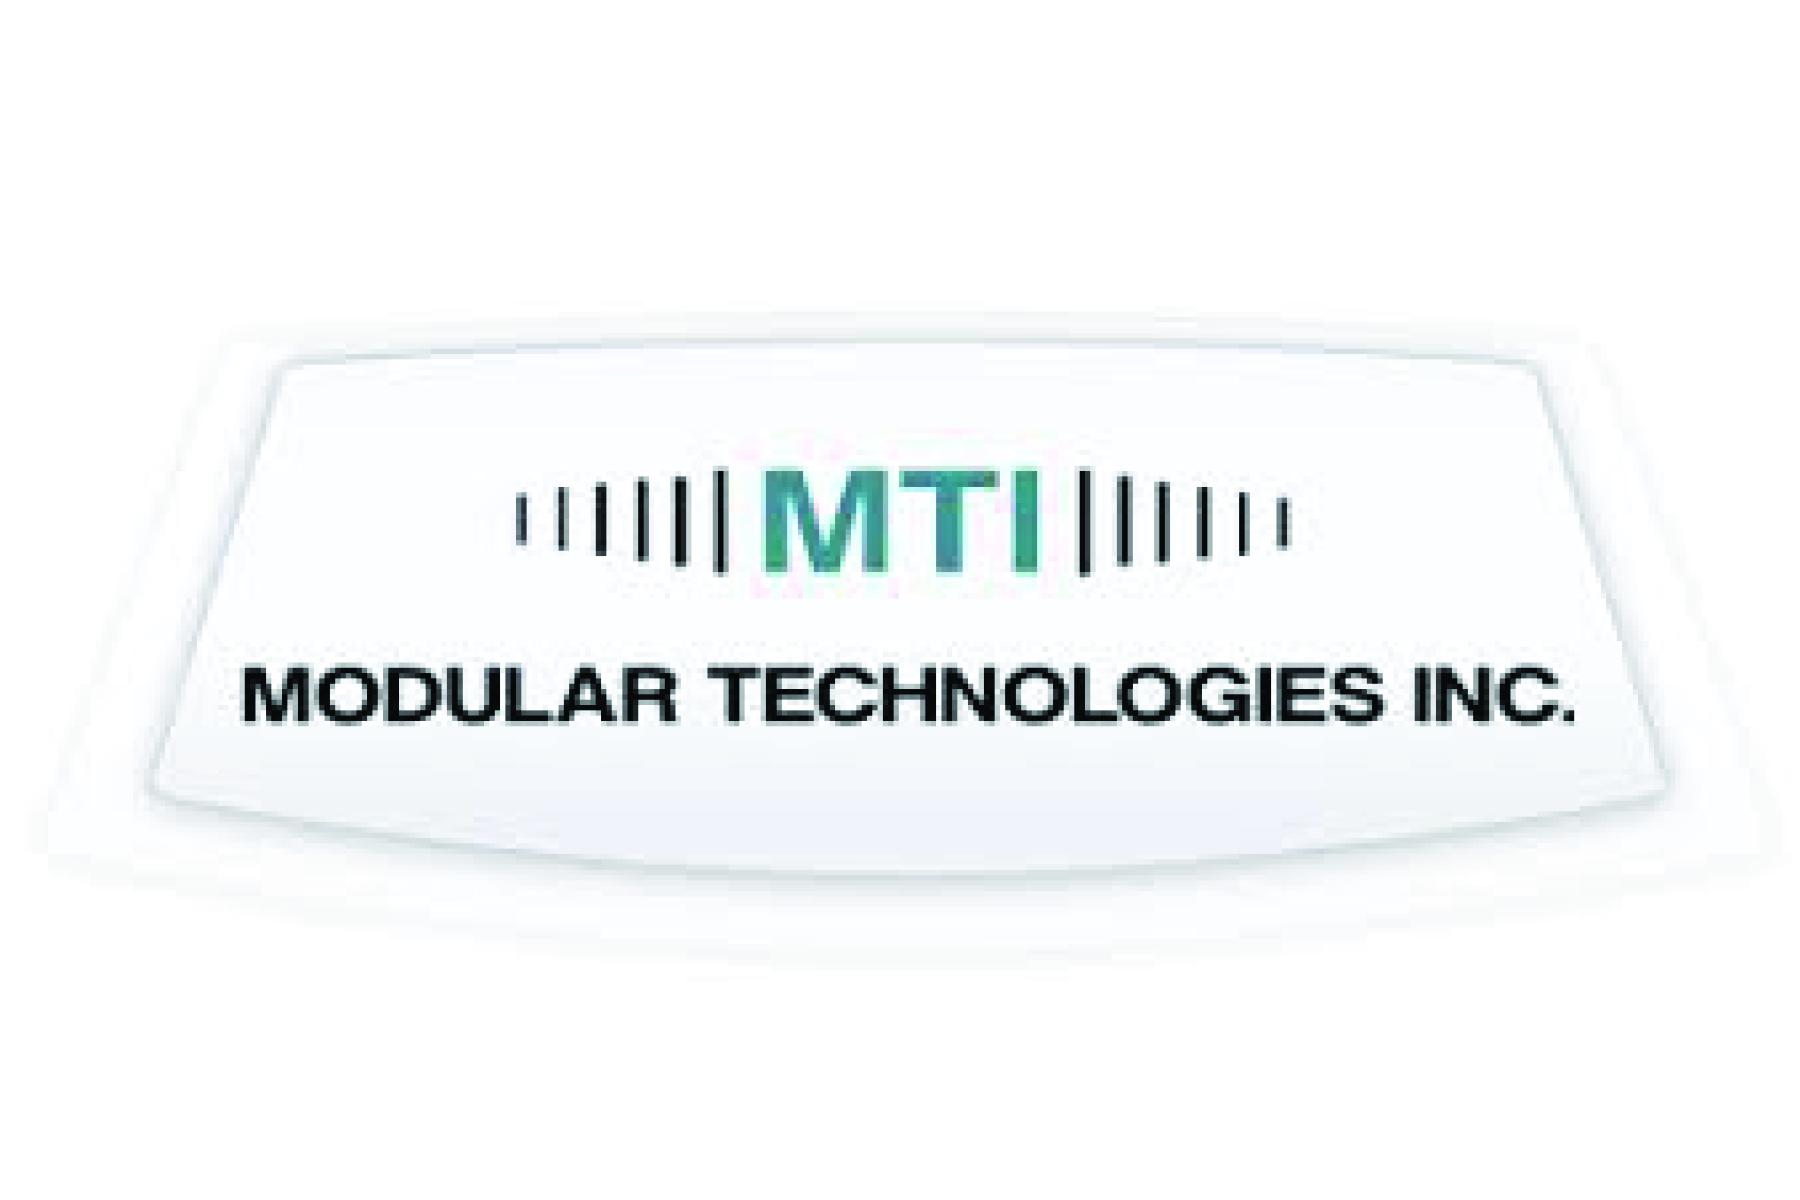 MODULAR TECHNOLOGIES INC. - PORTABLE BUILDING MANUFACTURER101 N Herritage St • Kinston, NC 28501(252) 522-5770